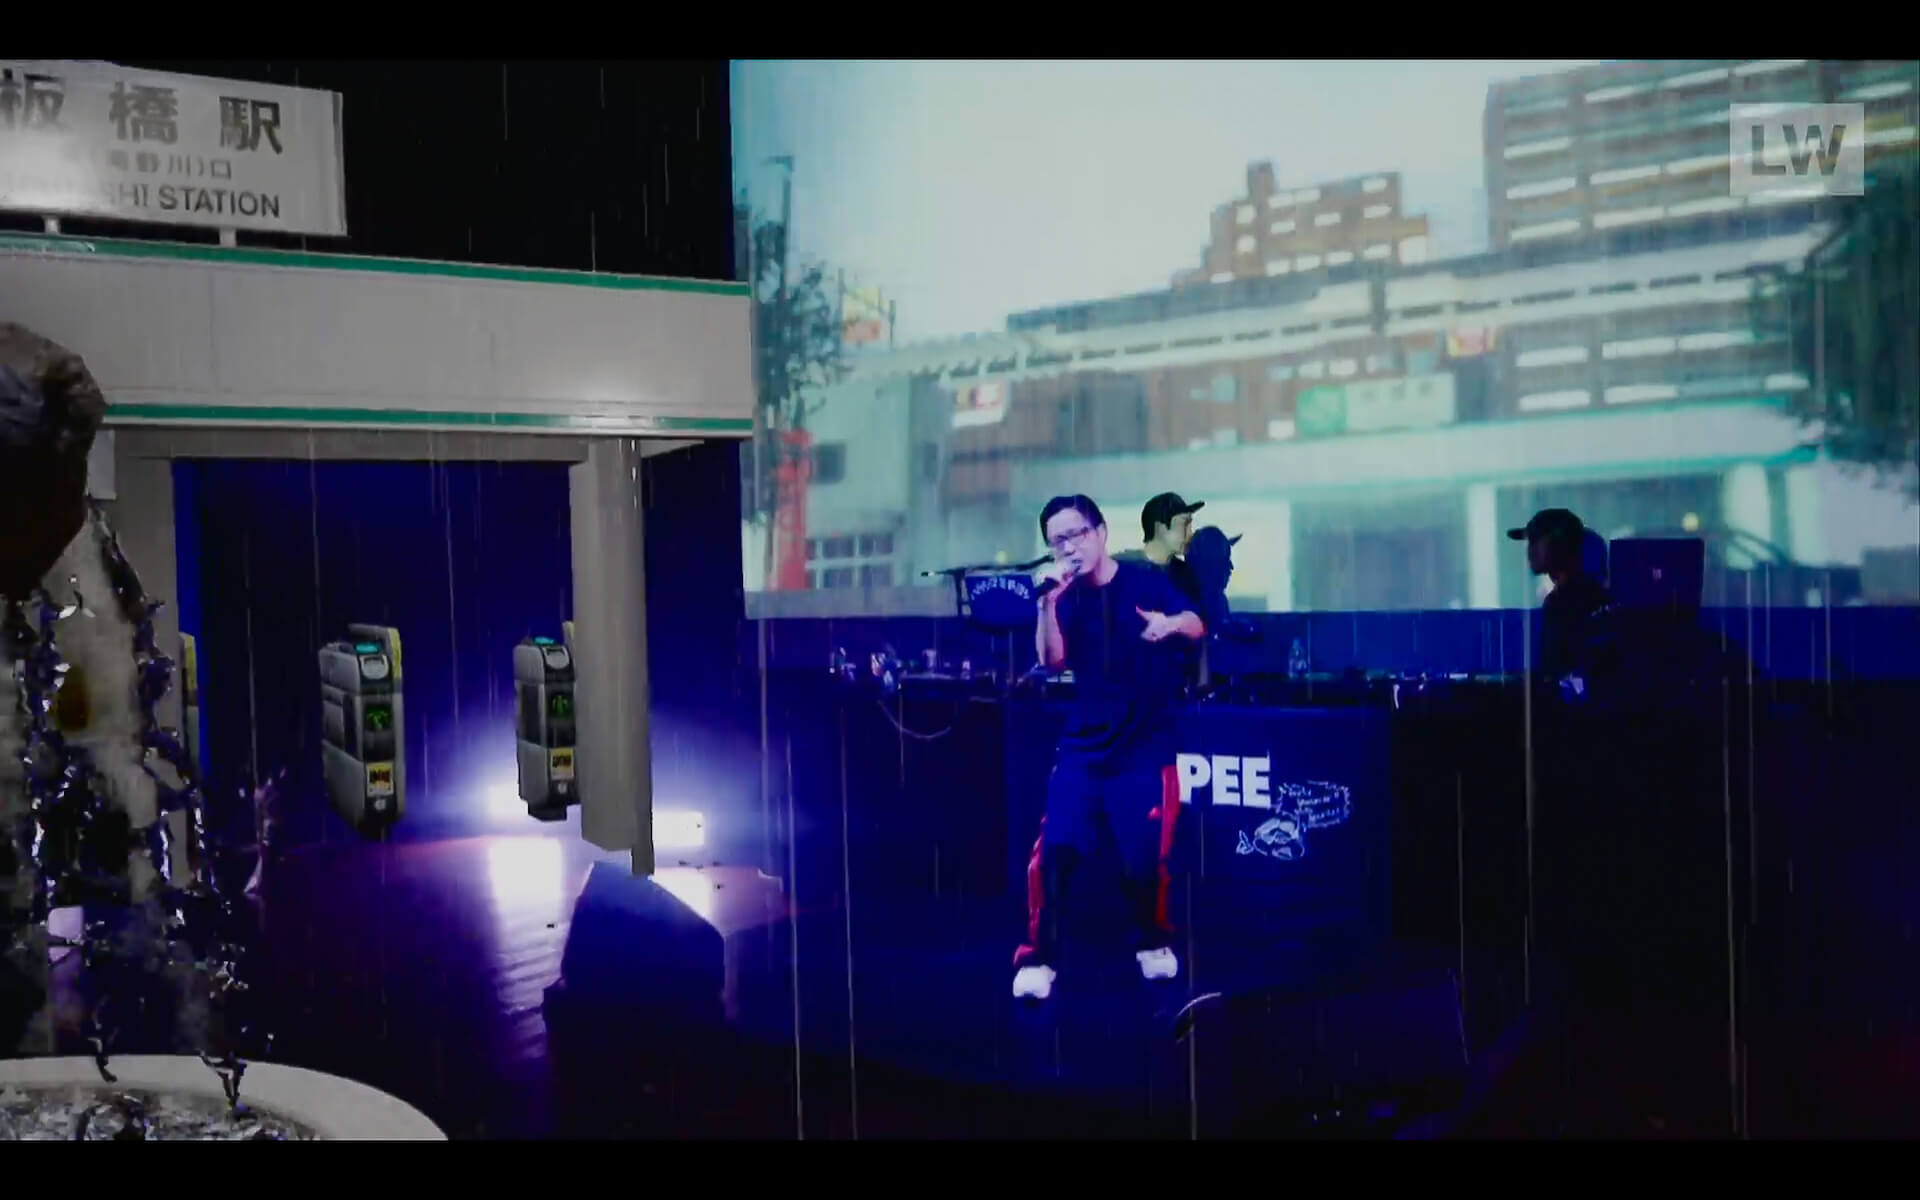 LIVEWIRE PUNPEE<Sofa Kingdomcome>のイースターエッグを一挙紹介! by みやーんZZ music200918_punpee_livewire_13